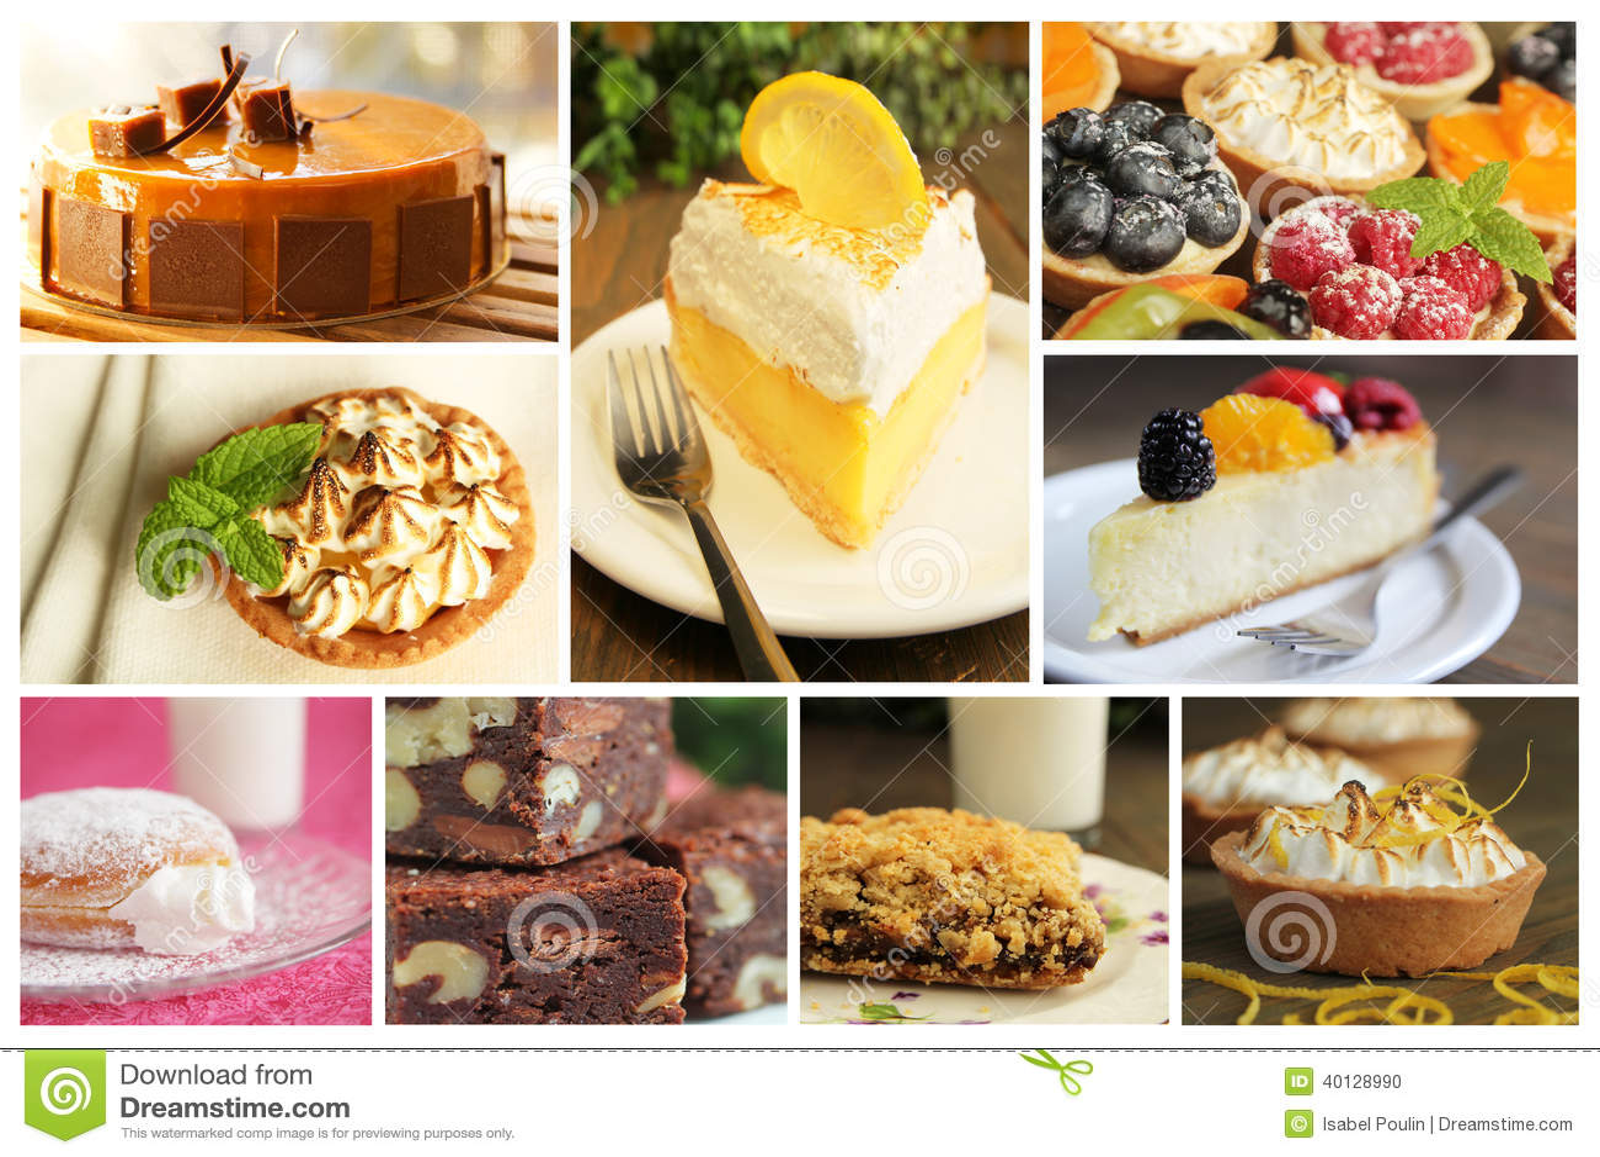 Dessert Collage Stock Photo Image 40128990